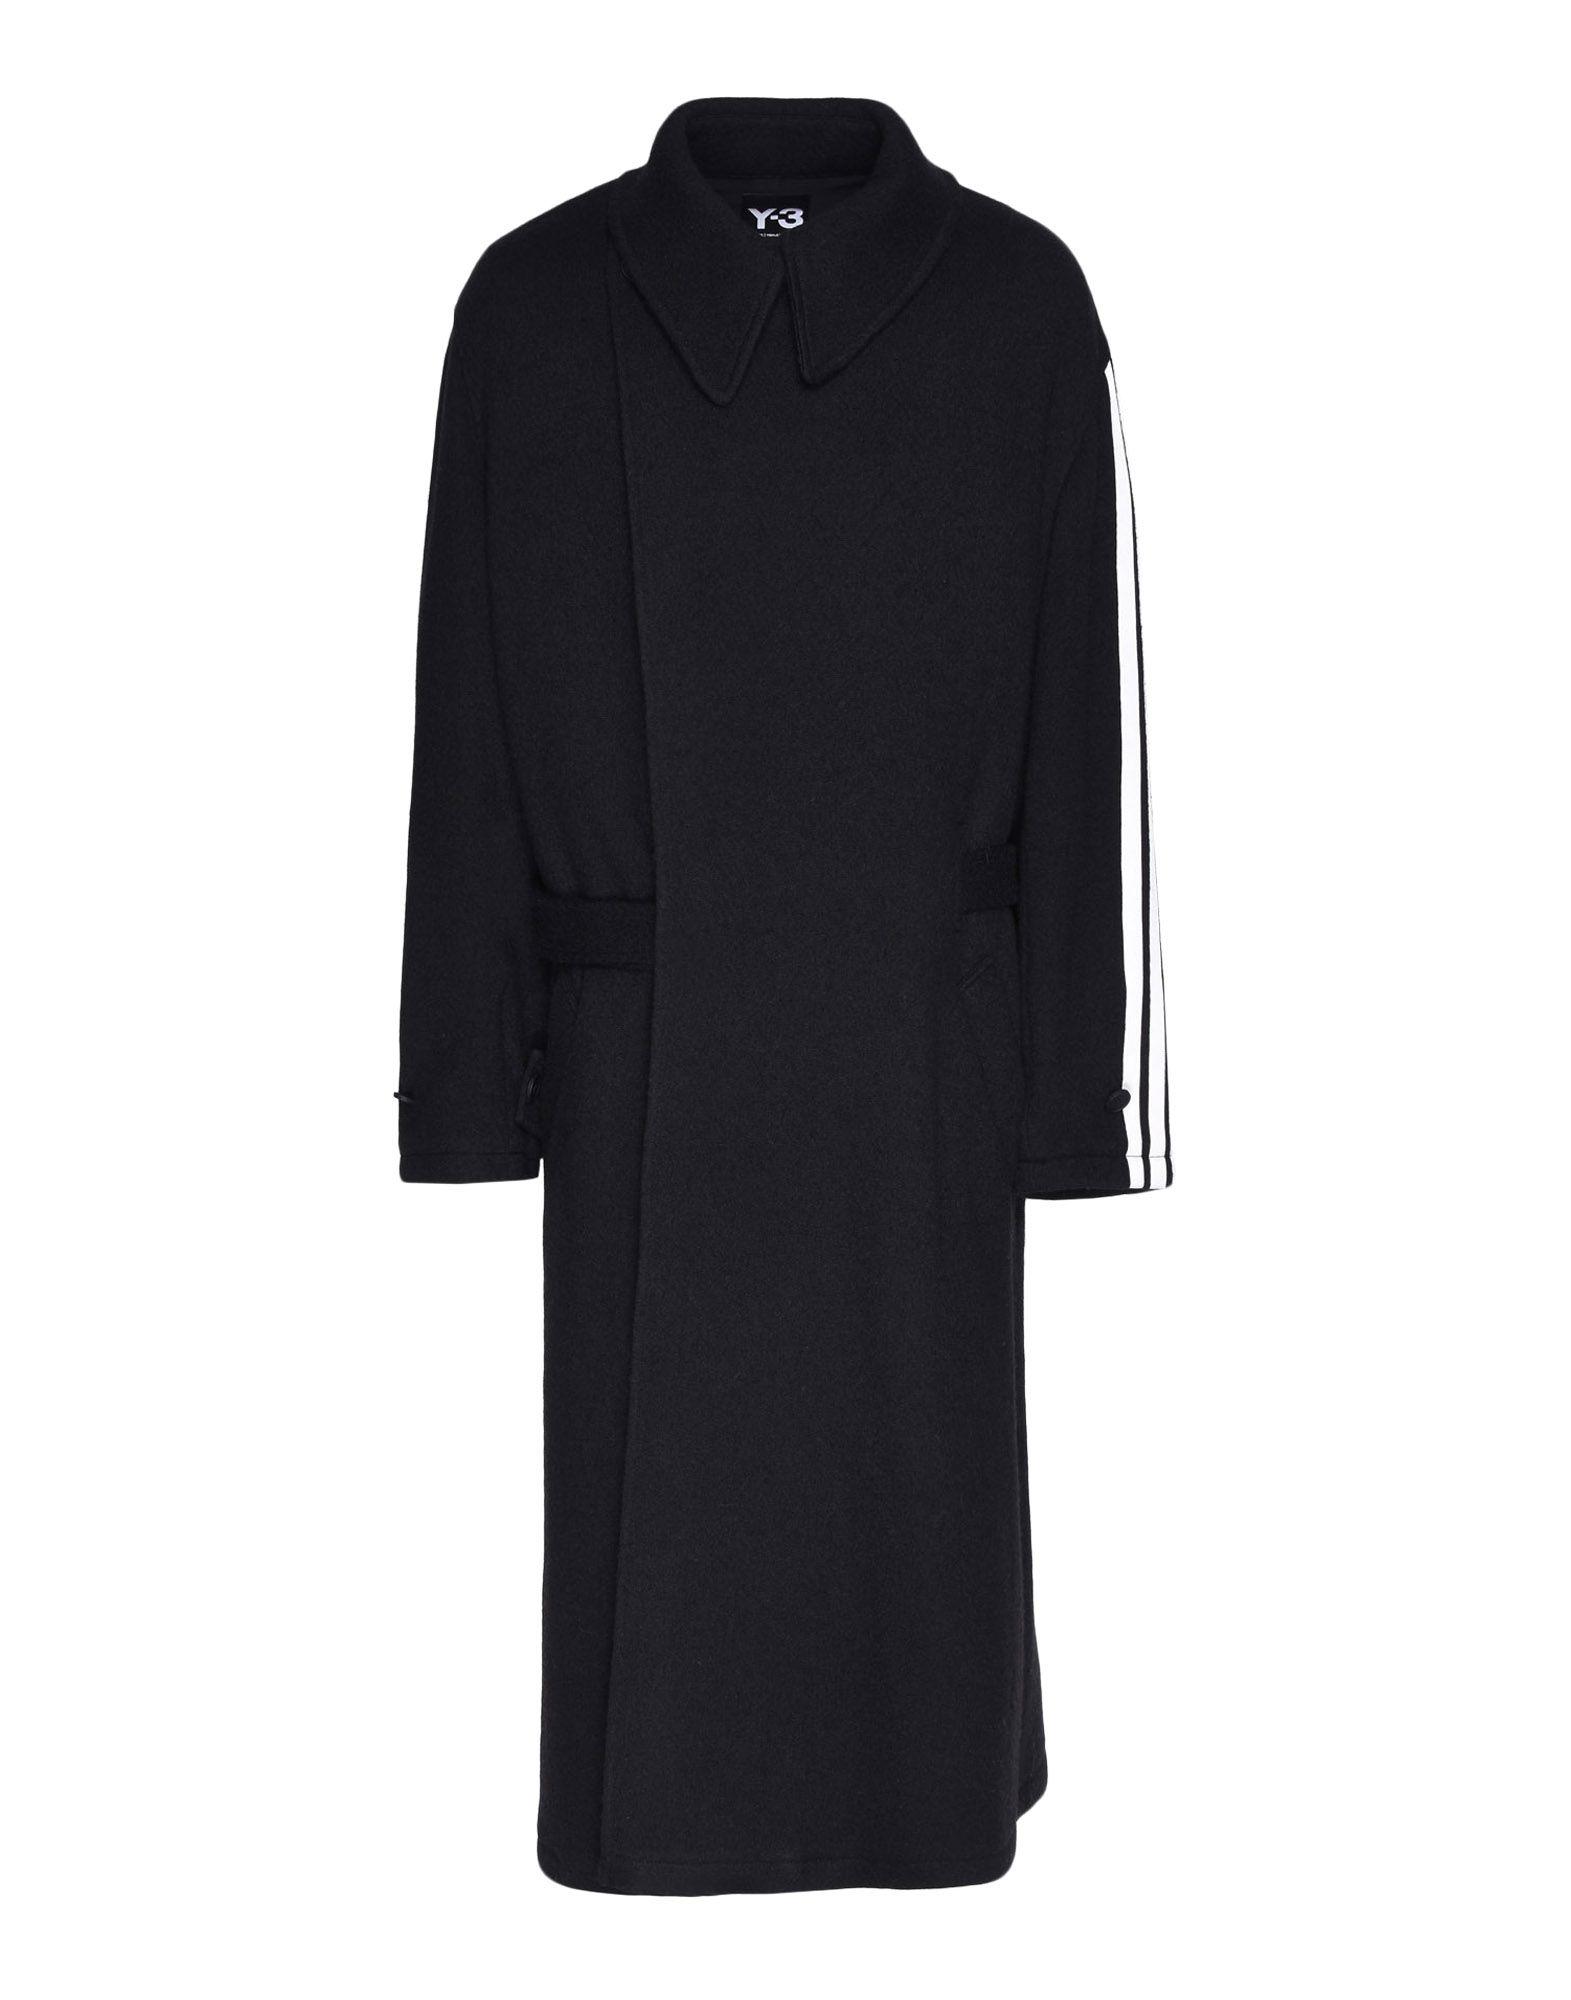 Y-3 Y-3 Tailored Wool Coat コート メンズ f